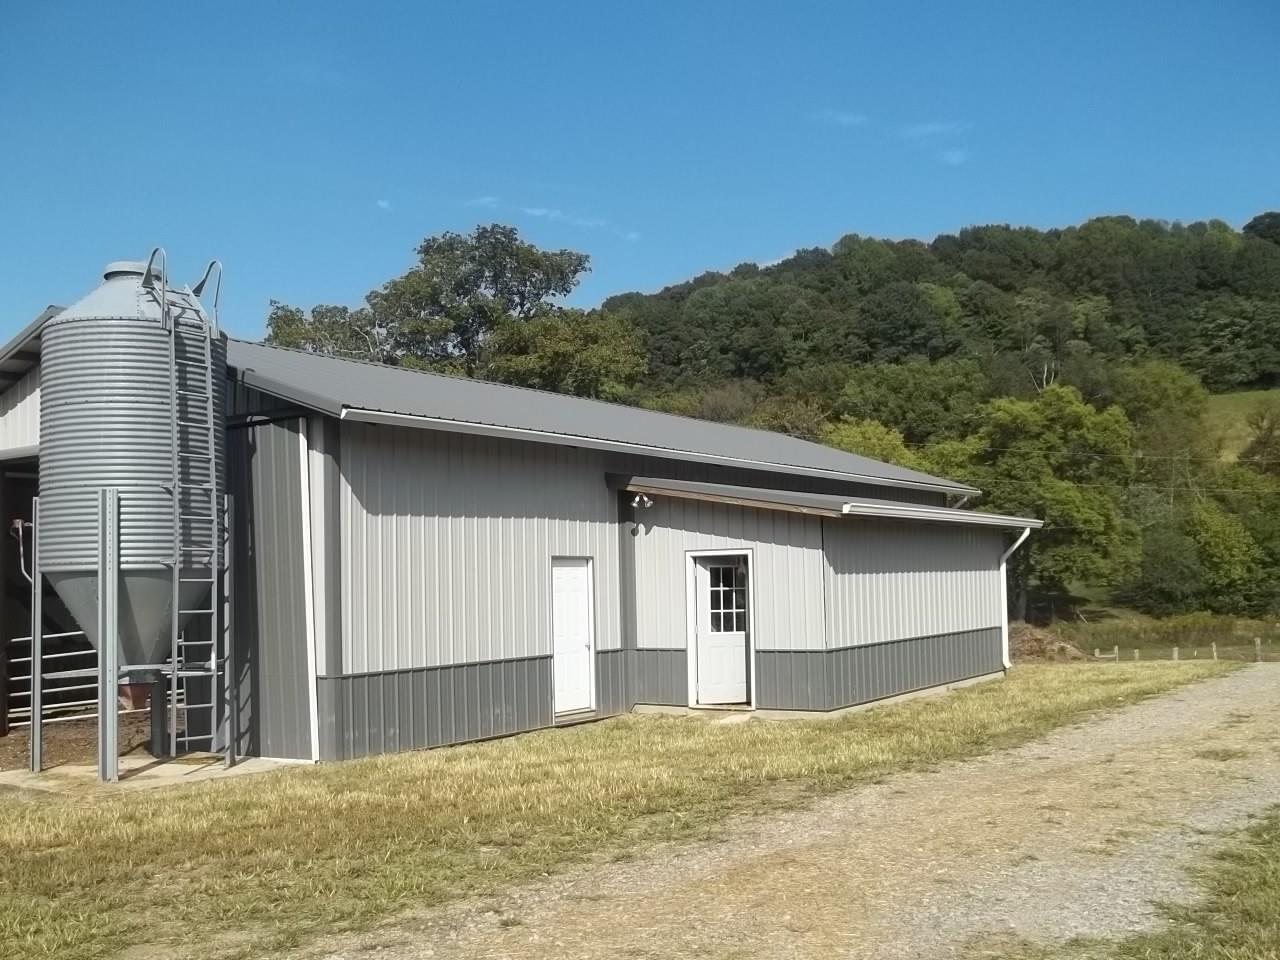 3498 John Allen Rd, Cornersville, TN 37047 - Cornersville, TN real estate listing